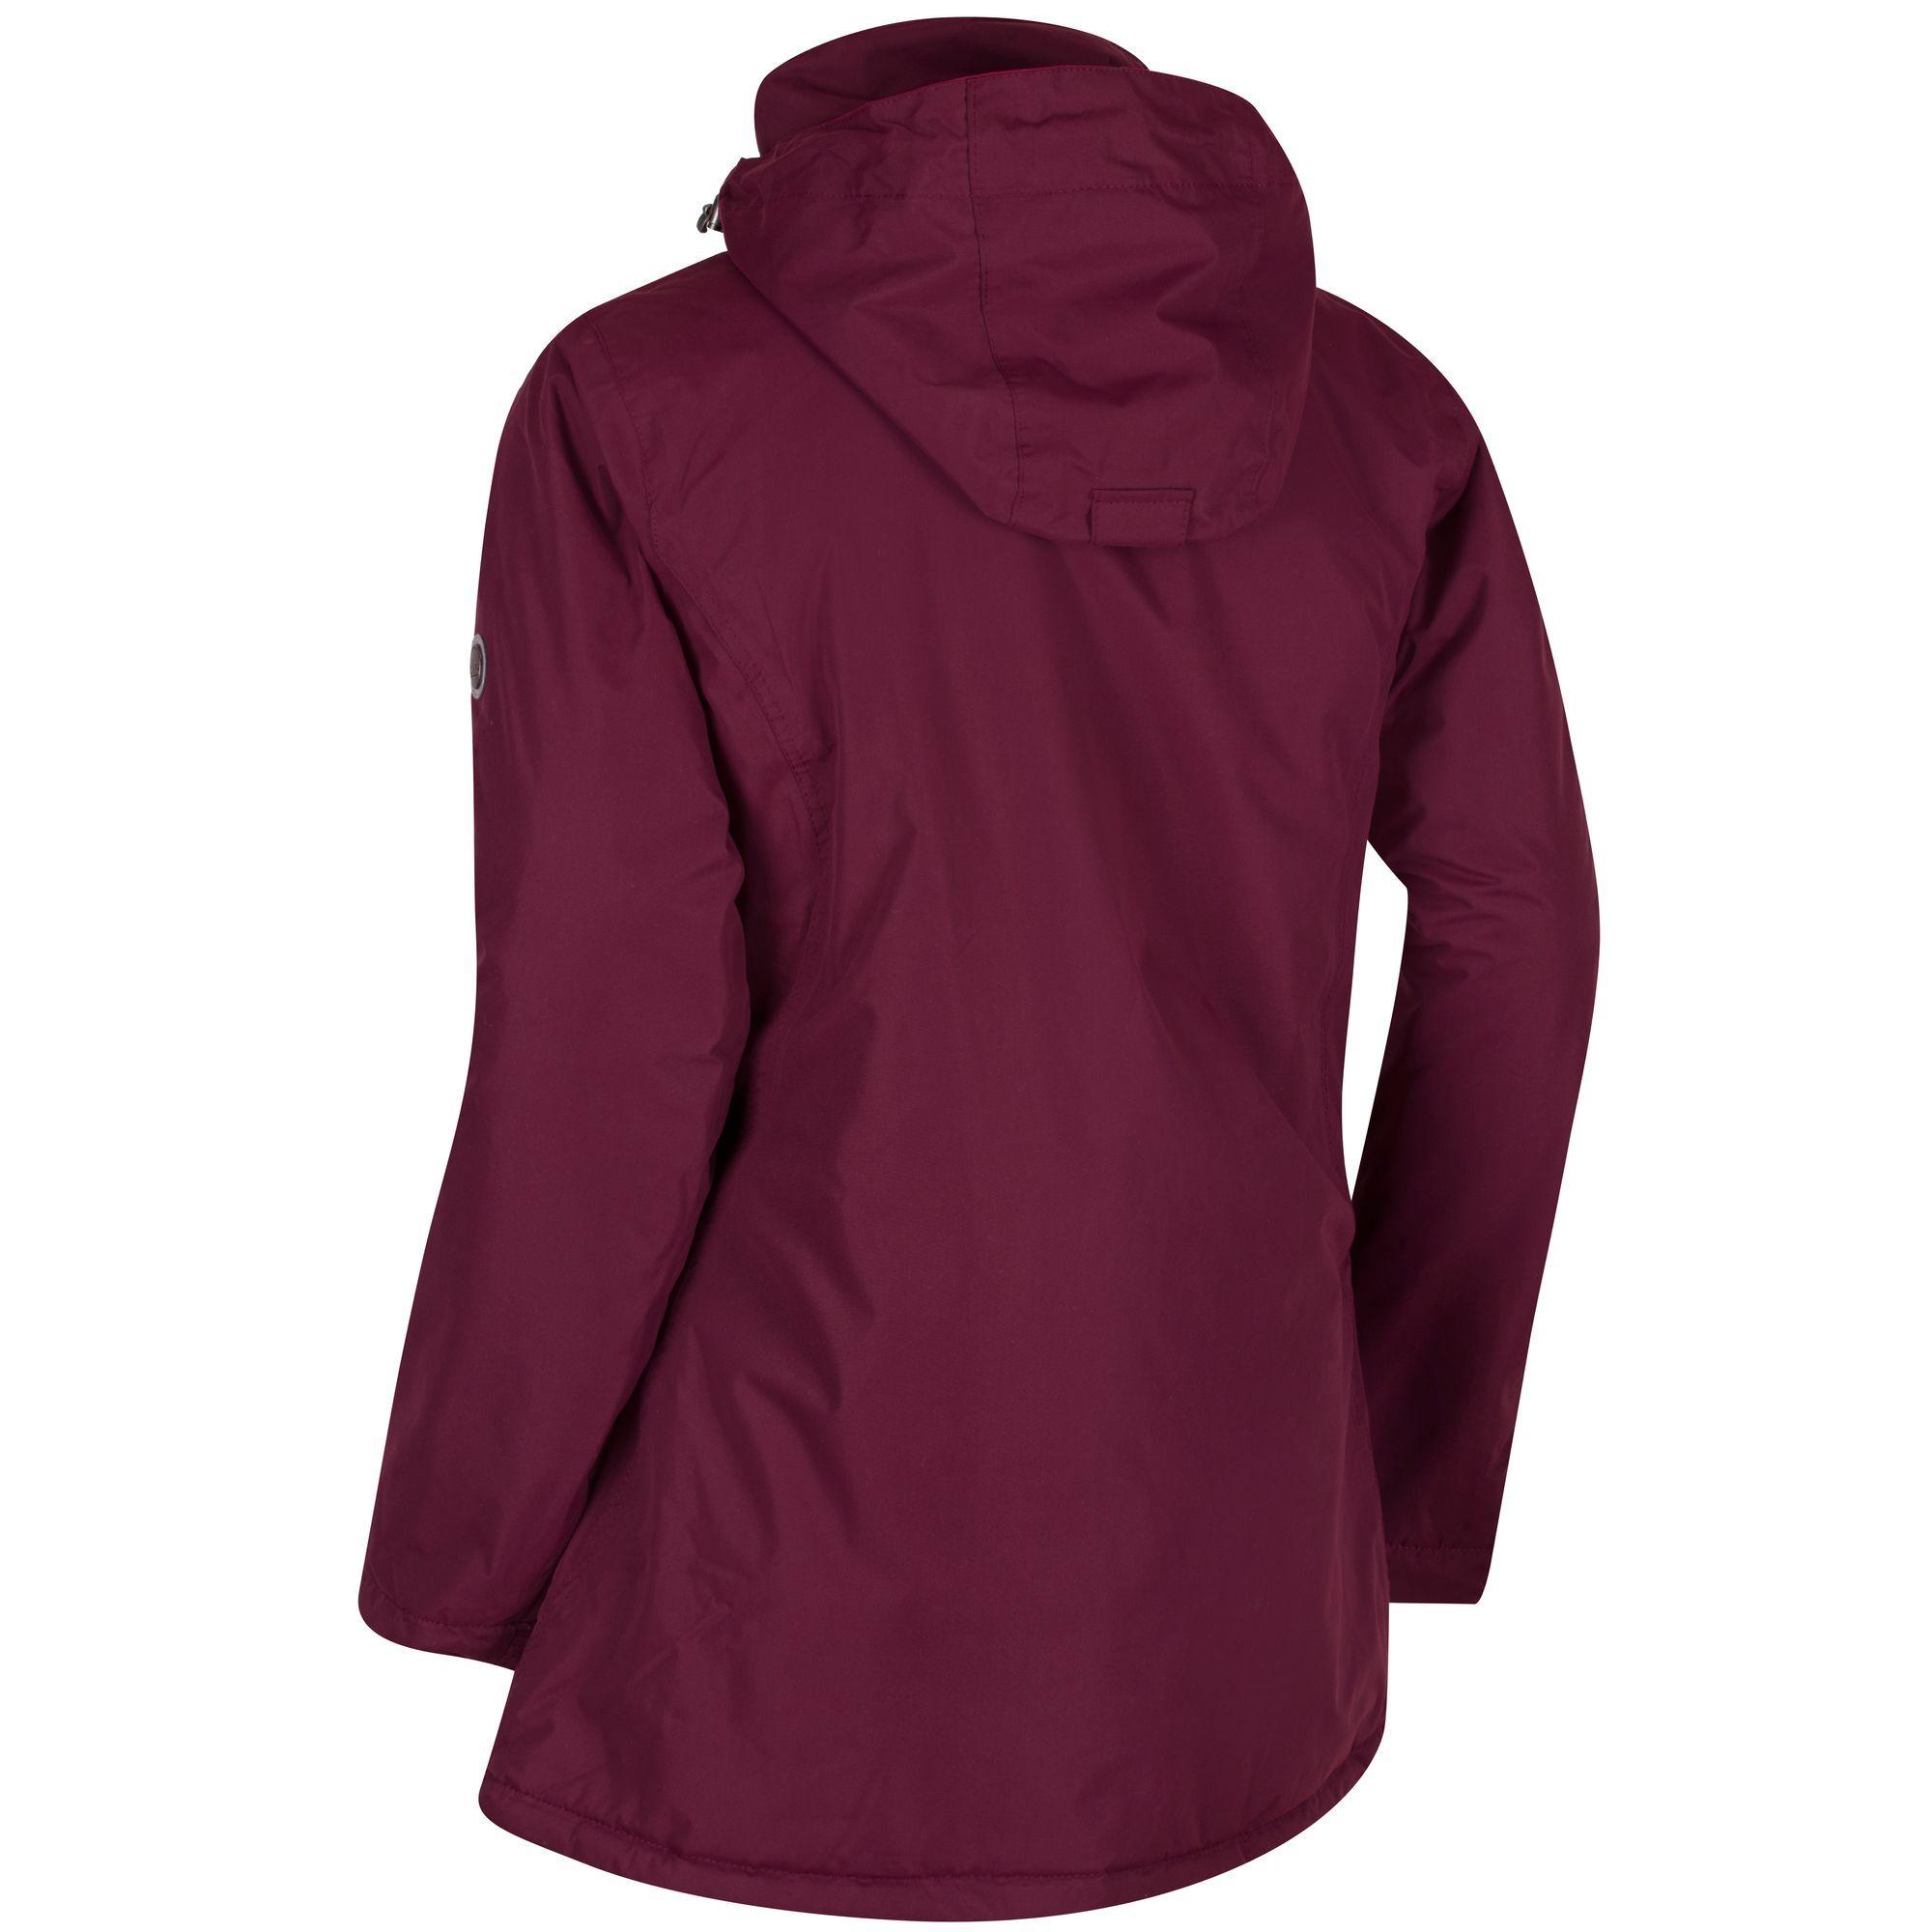 Regatta Womens//Ladies Blanchet II Jacket RG3109